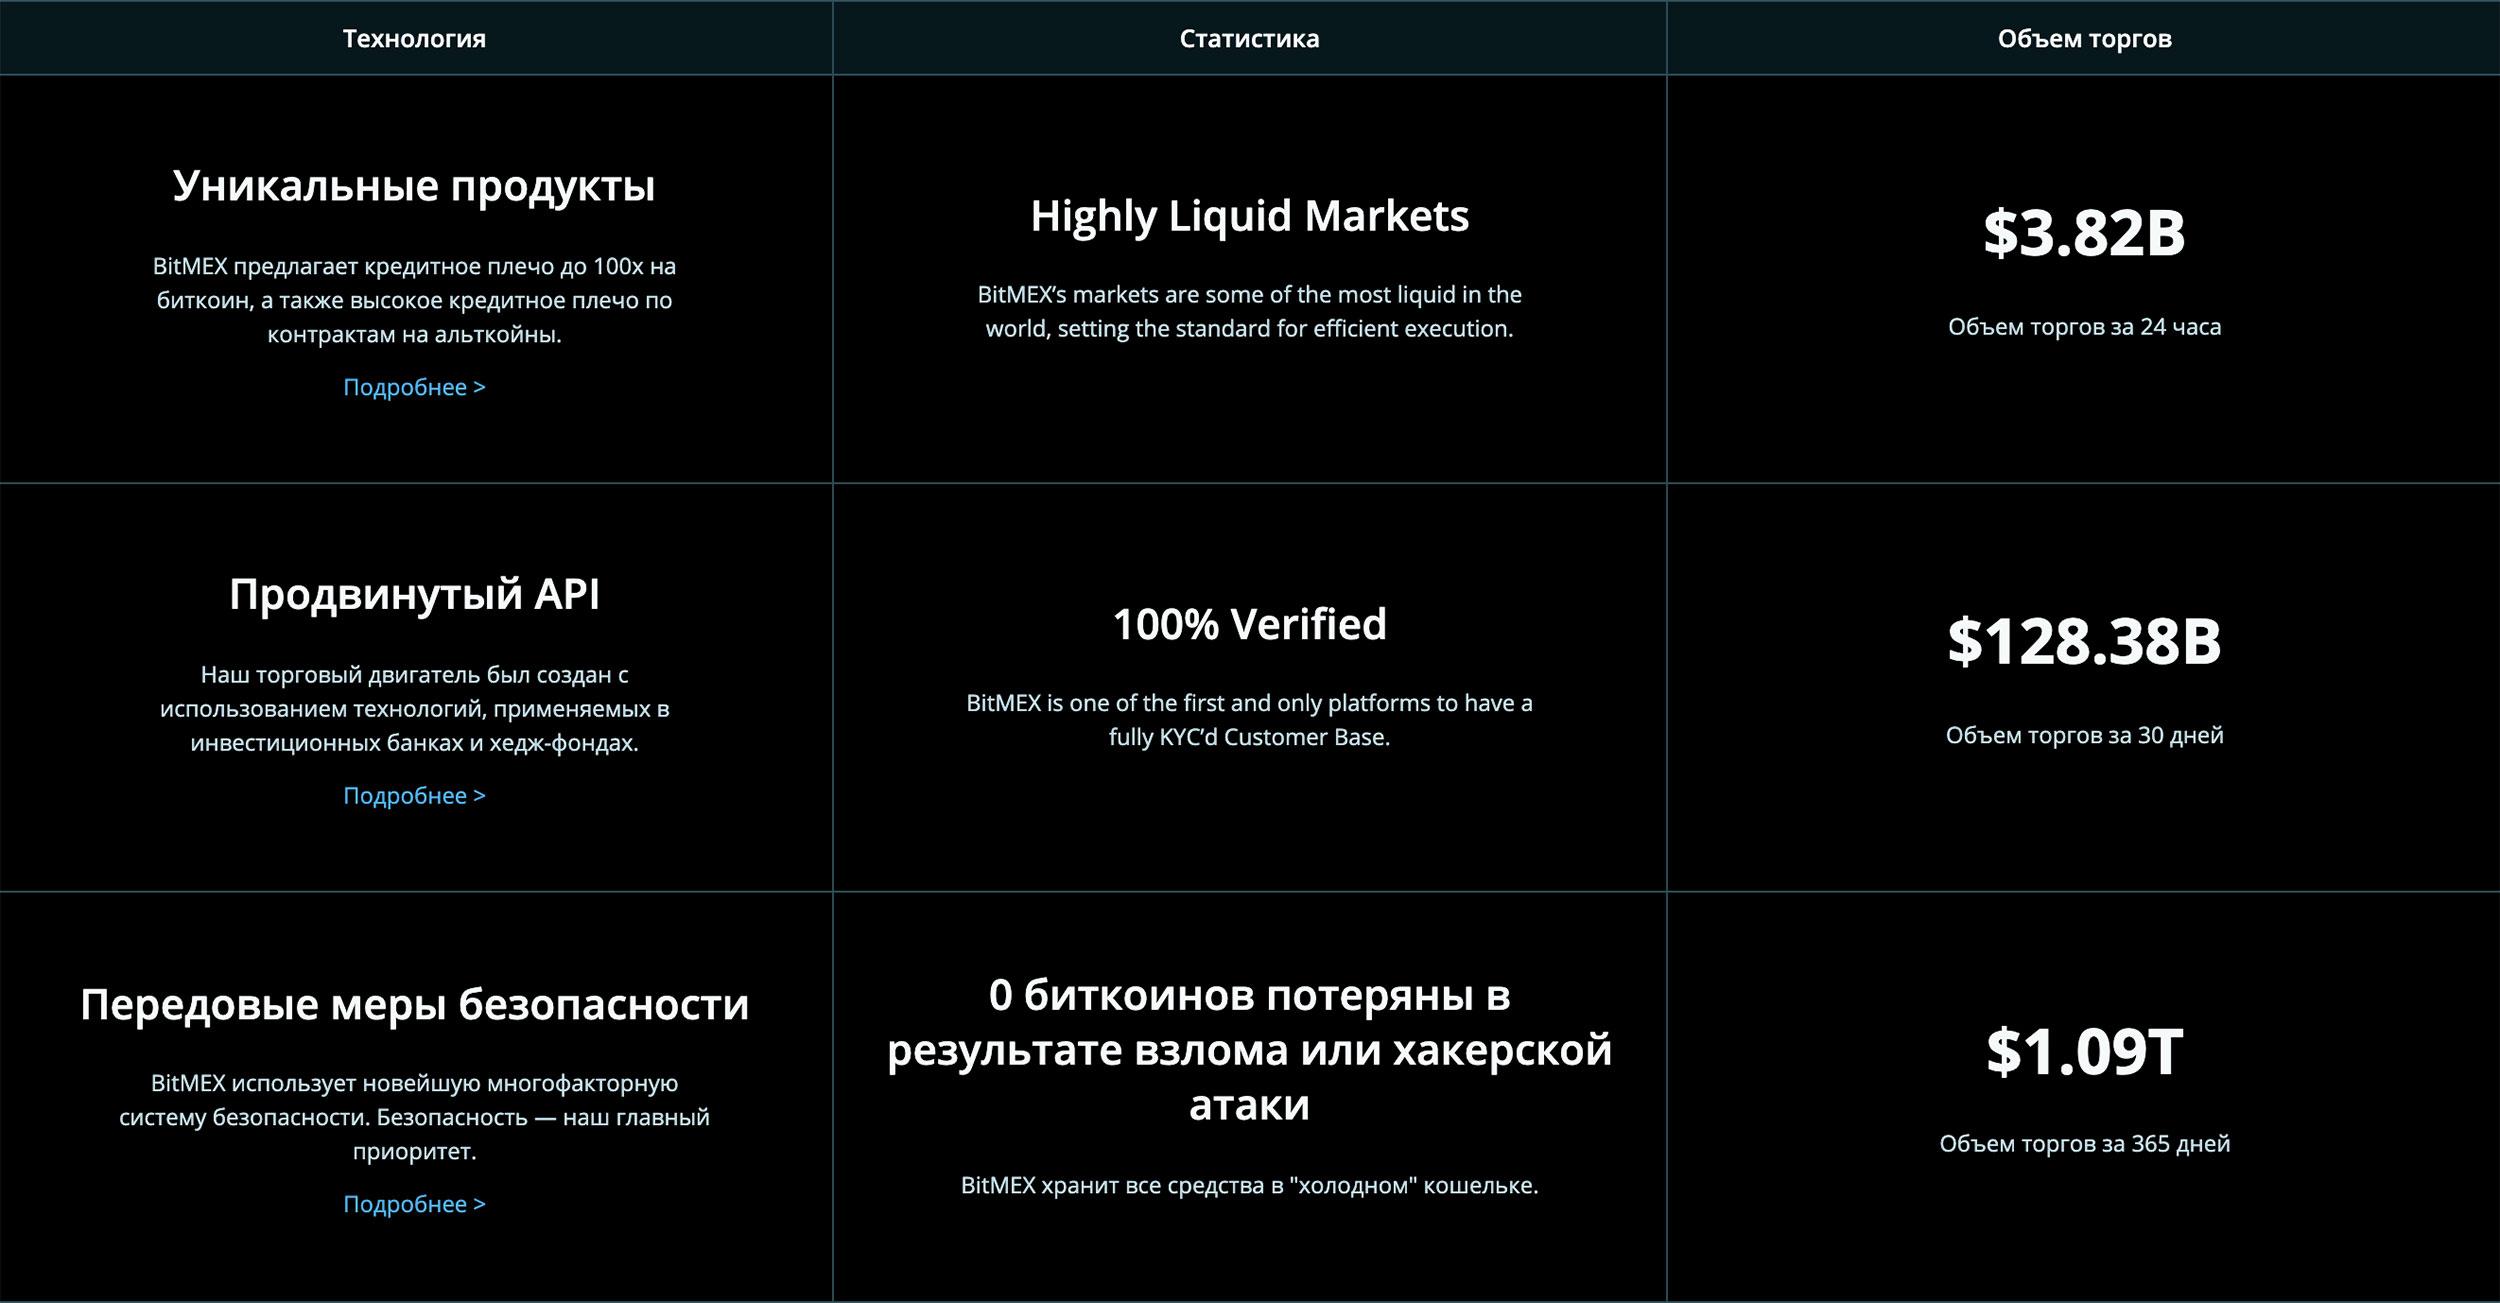 bitmex криптовалютная биржа